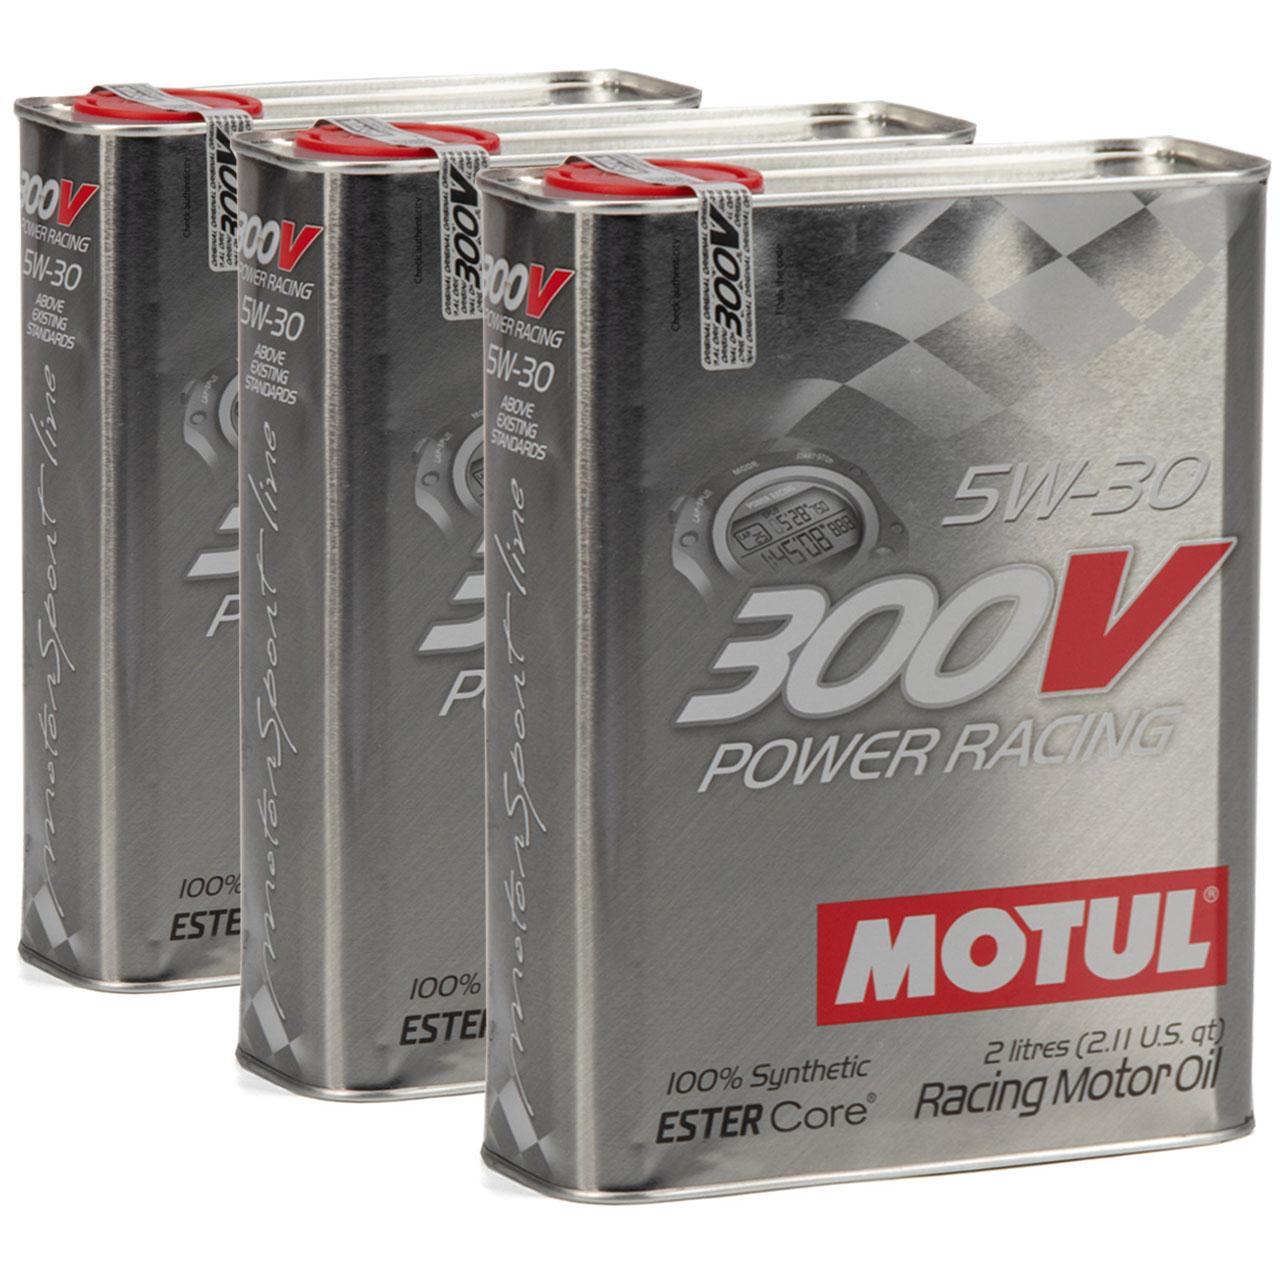 MOTUL 300V POWER RACING Motoröl Öl 5W30 100% Synthetic Ester Core - 6L 6 Liter